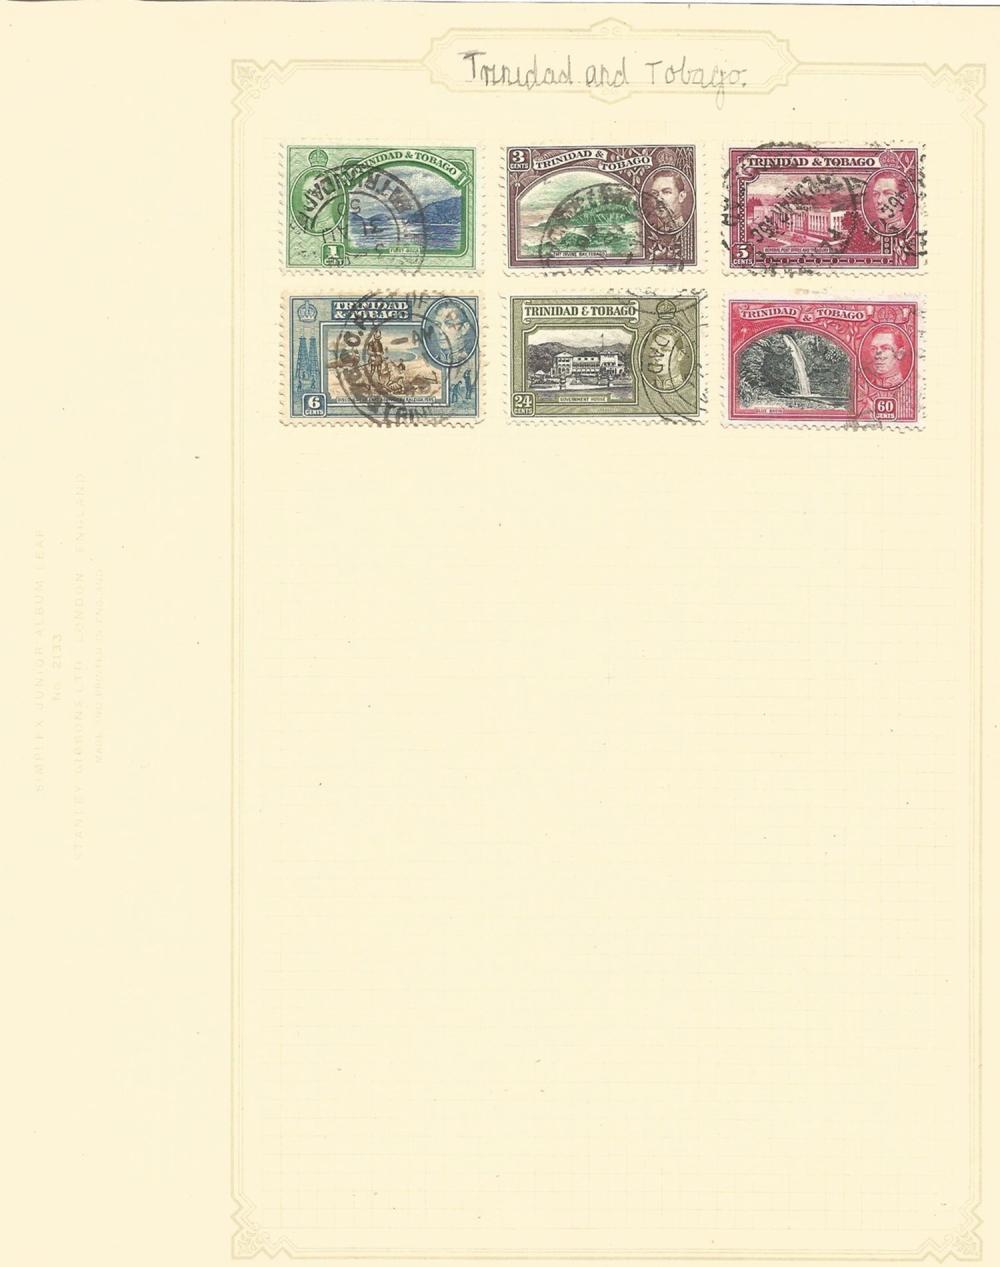 British Commonwealth, including Trinidad and Tobago, British Guiana, Aden, Seychelles, approx. 25.